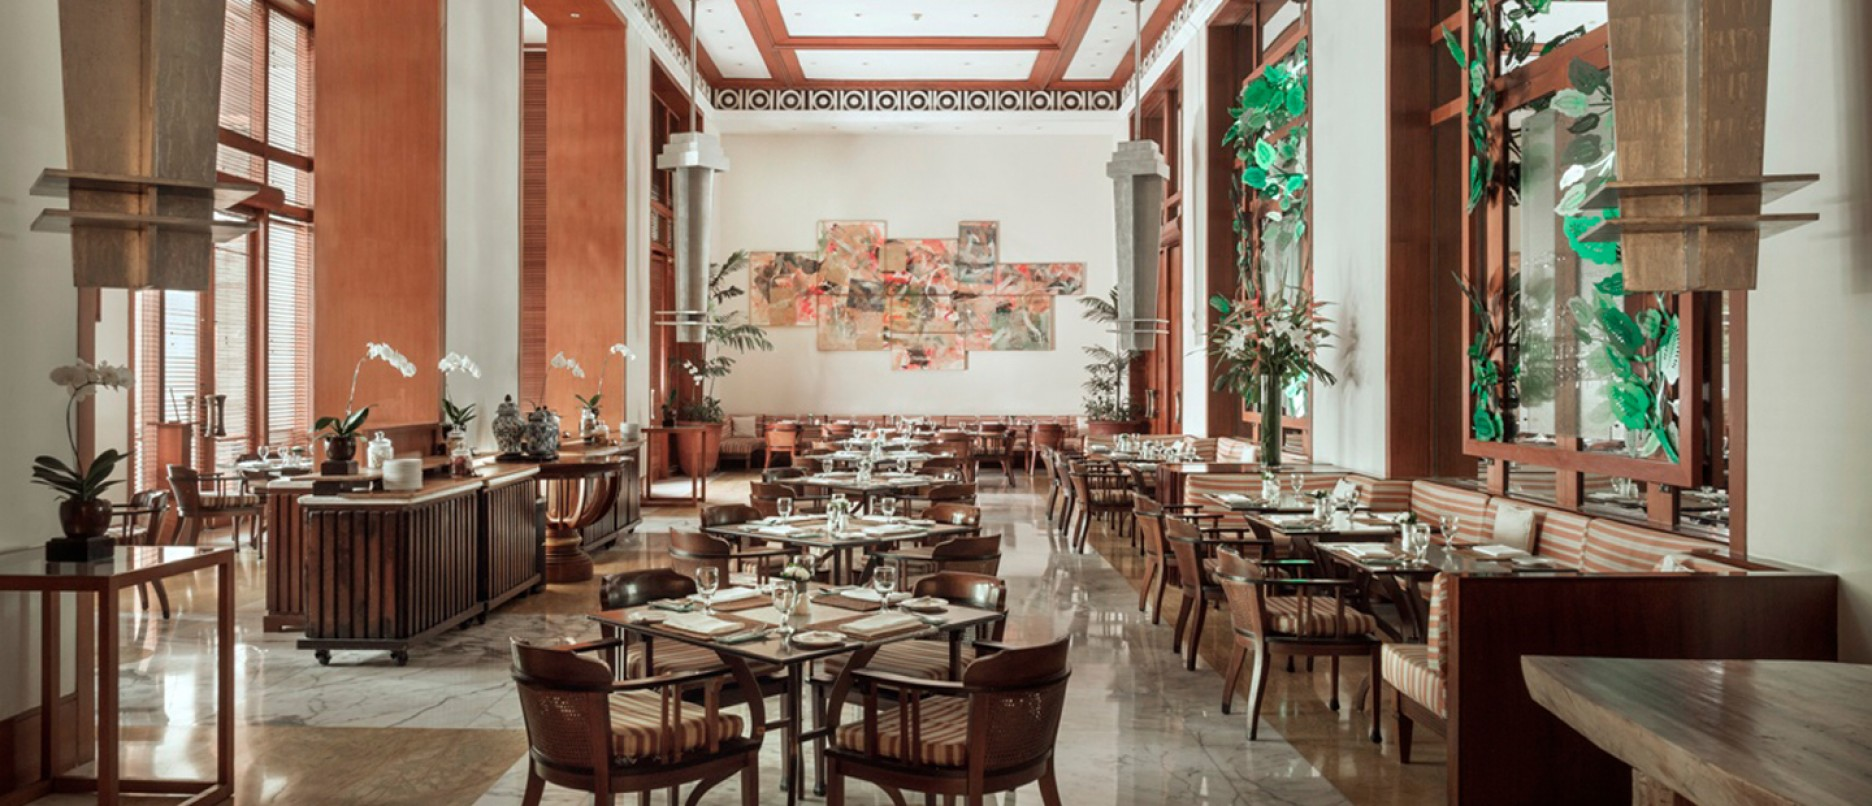 Jakarta Restaurant Interior